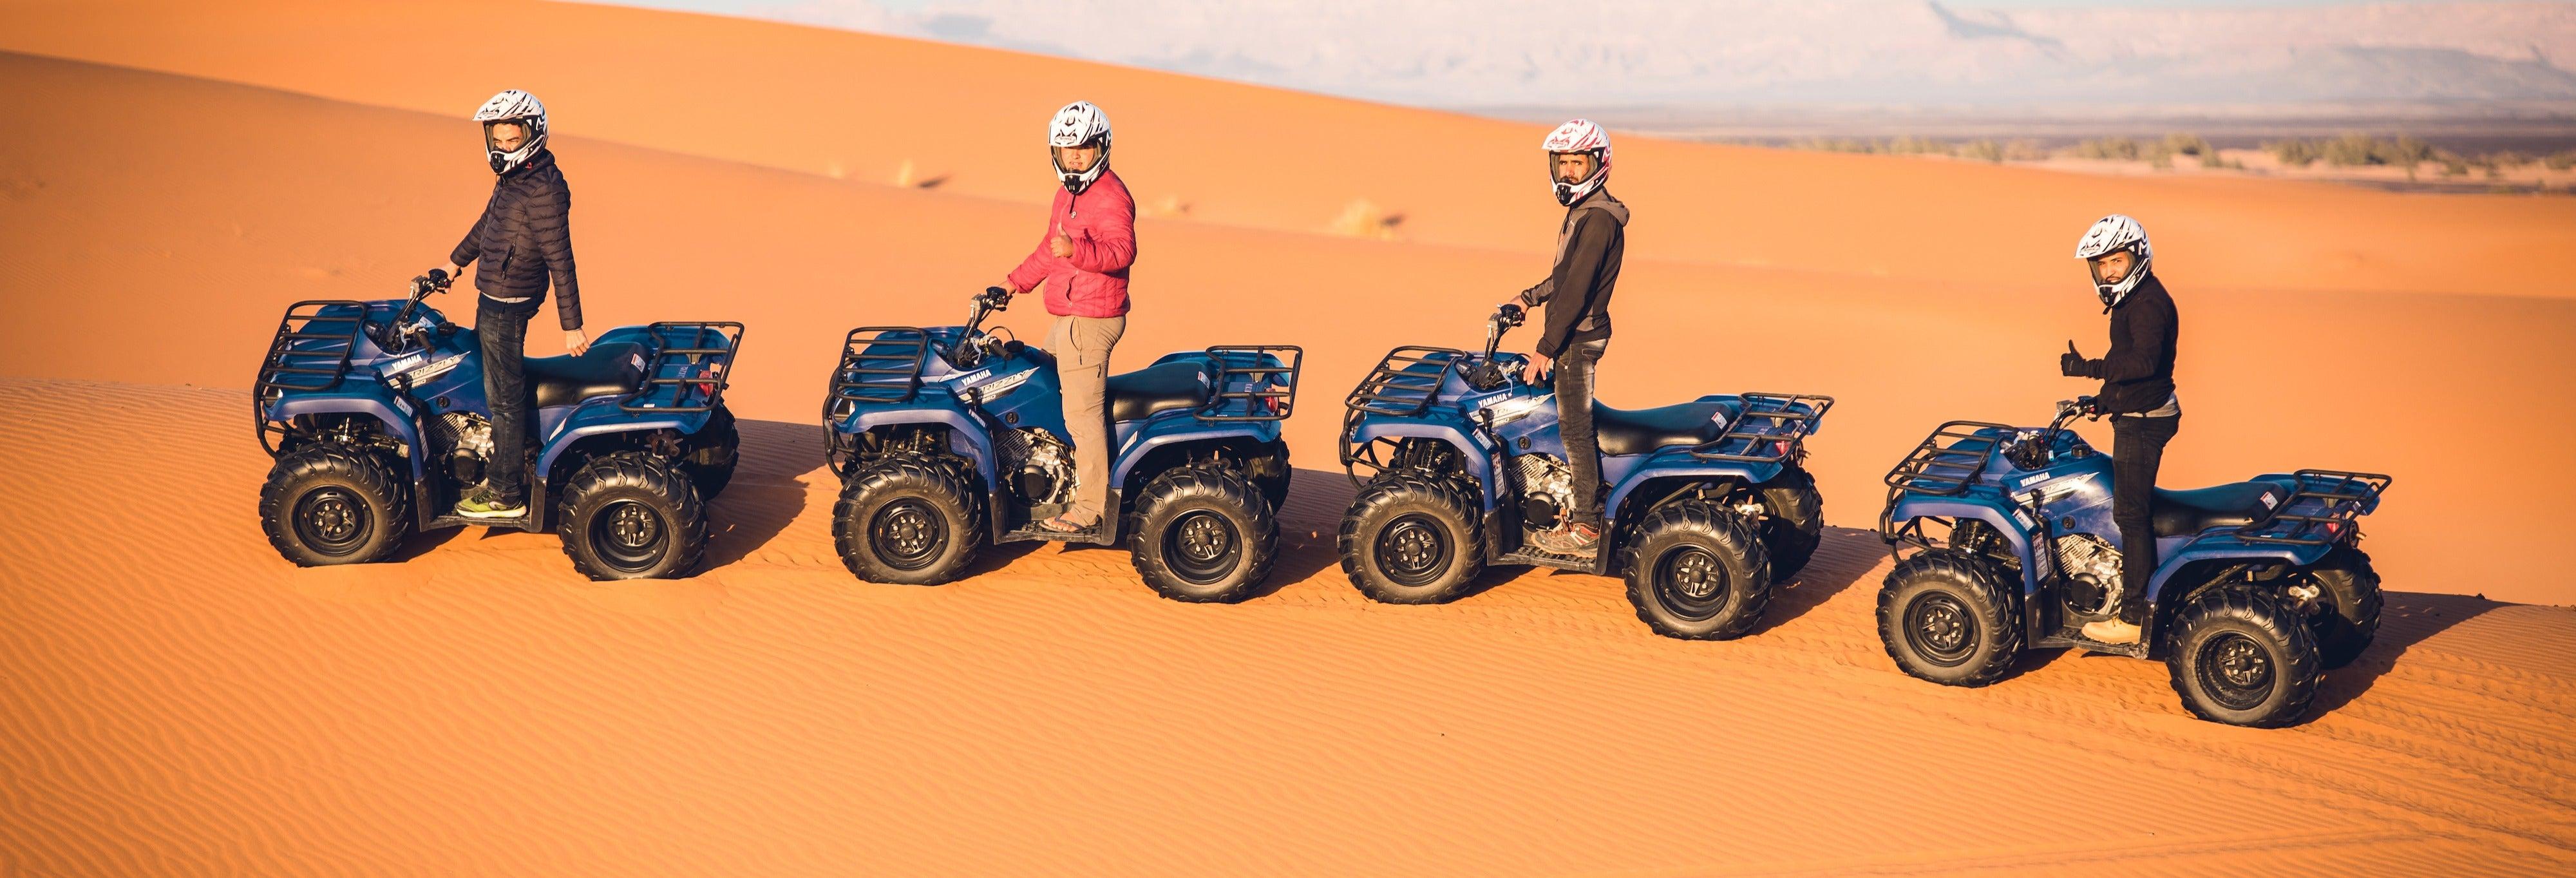 Tour en quad por el desierto de Merzouga